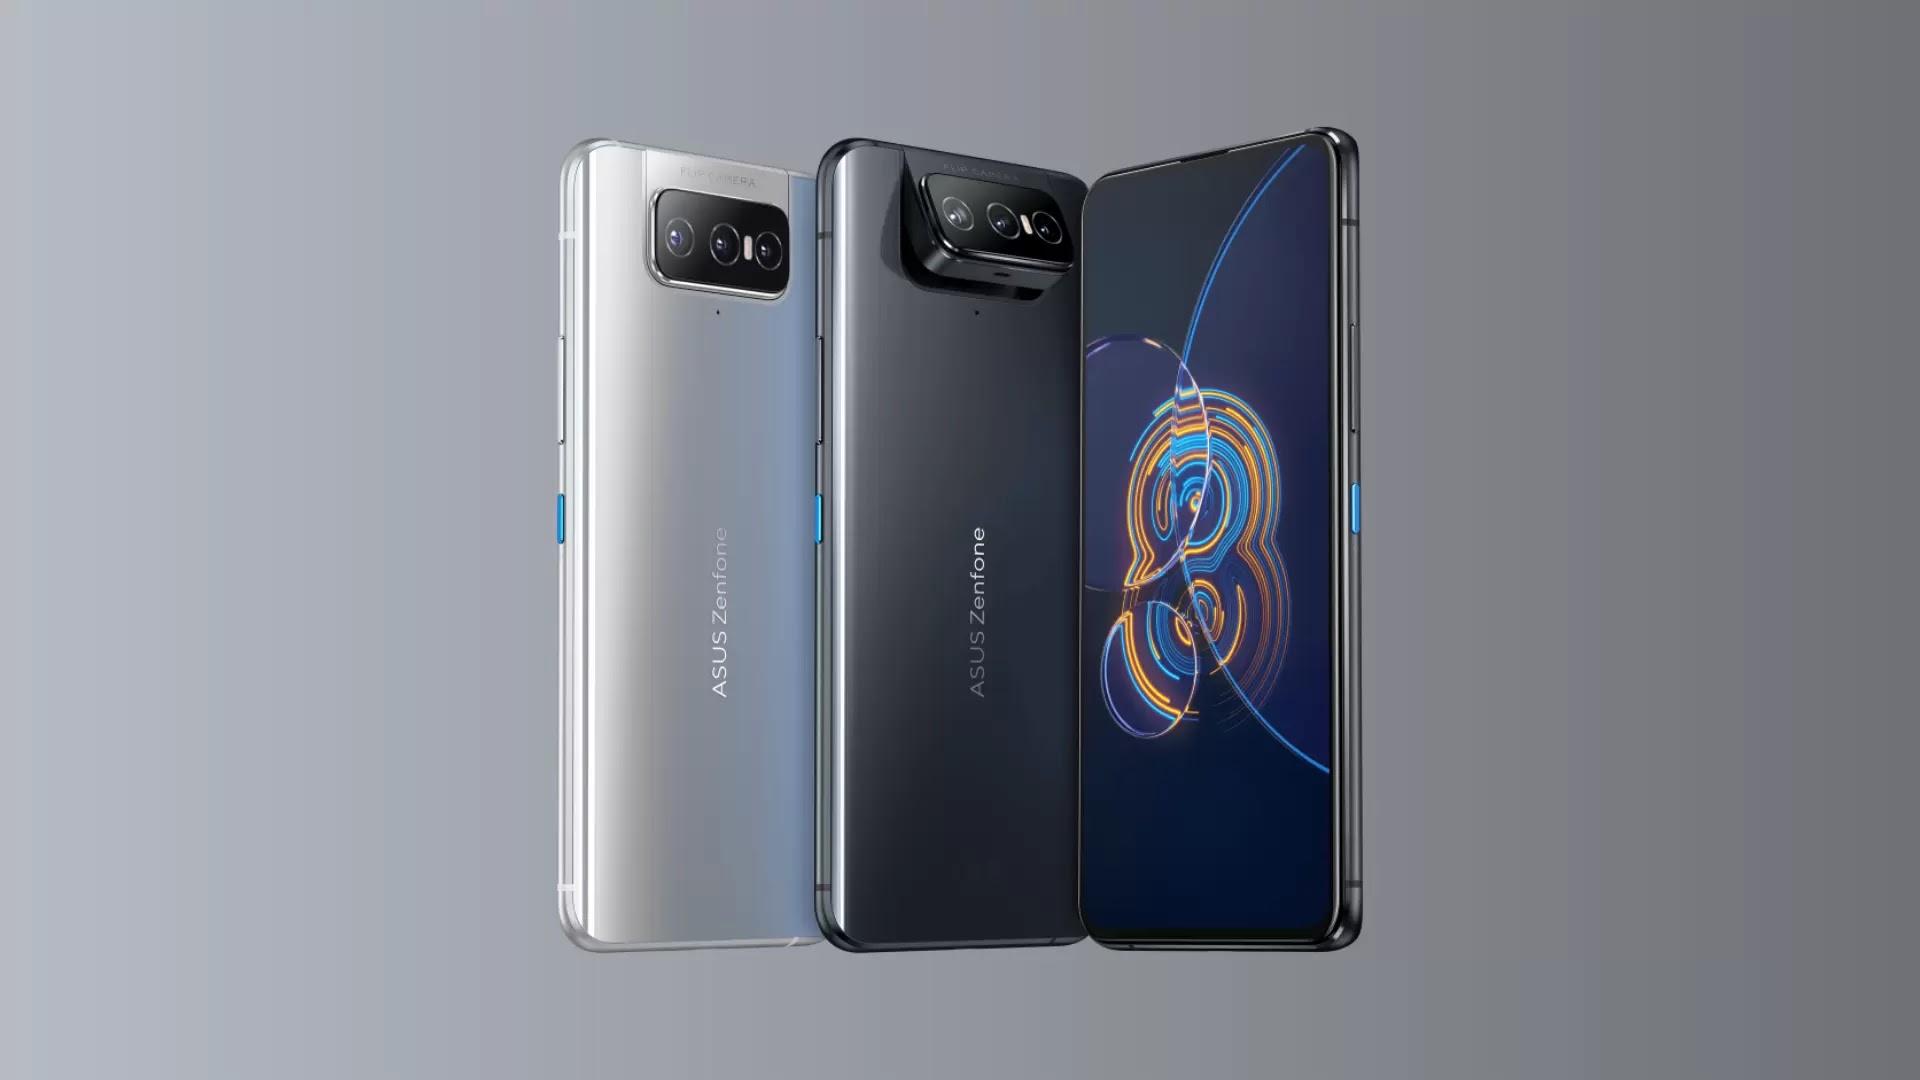 Asus এর নতুন ZenFone 8 Flip স্মার্টফোনটি হয়েছে লঞ্চ